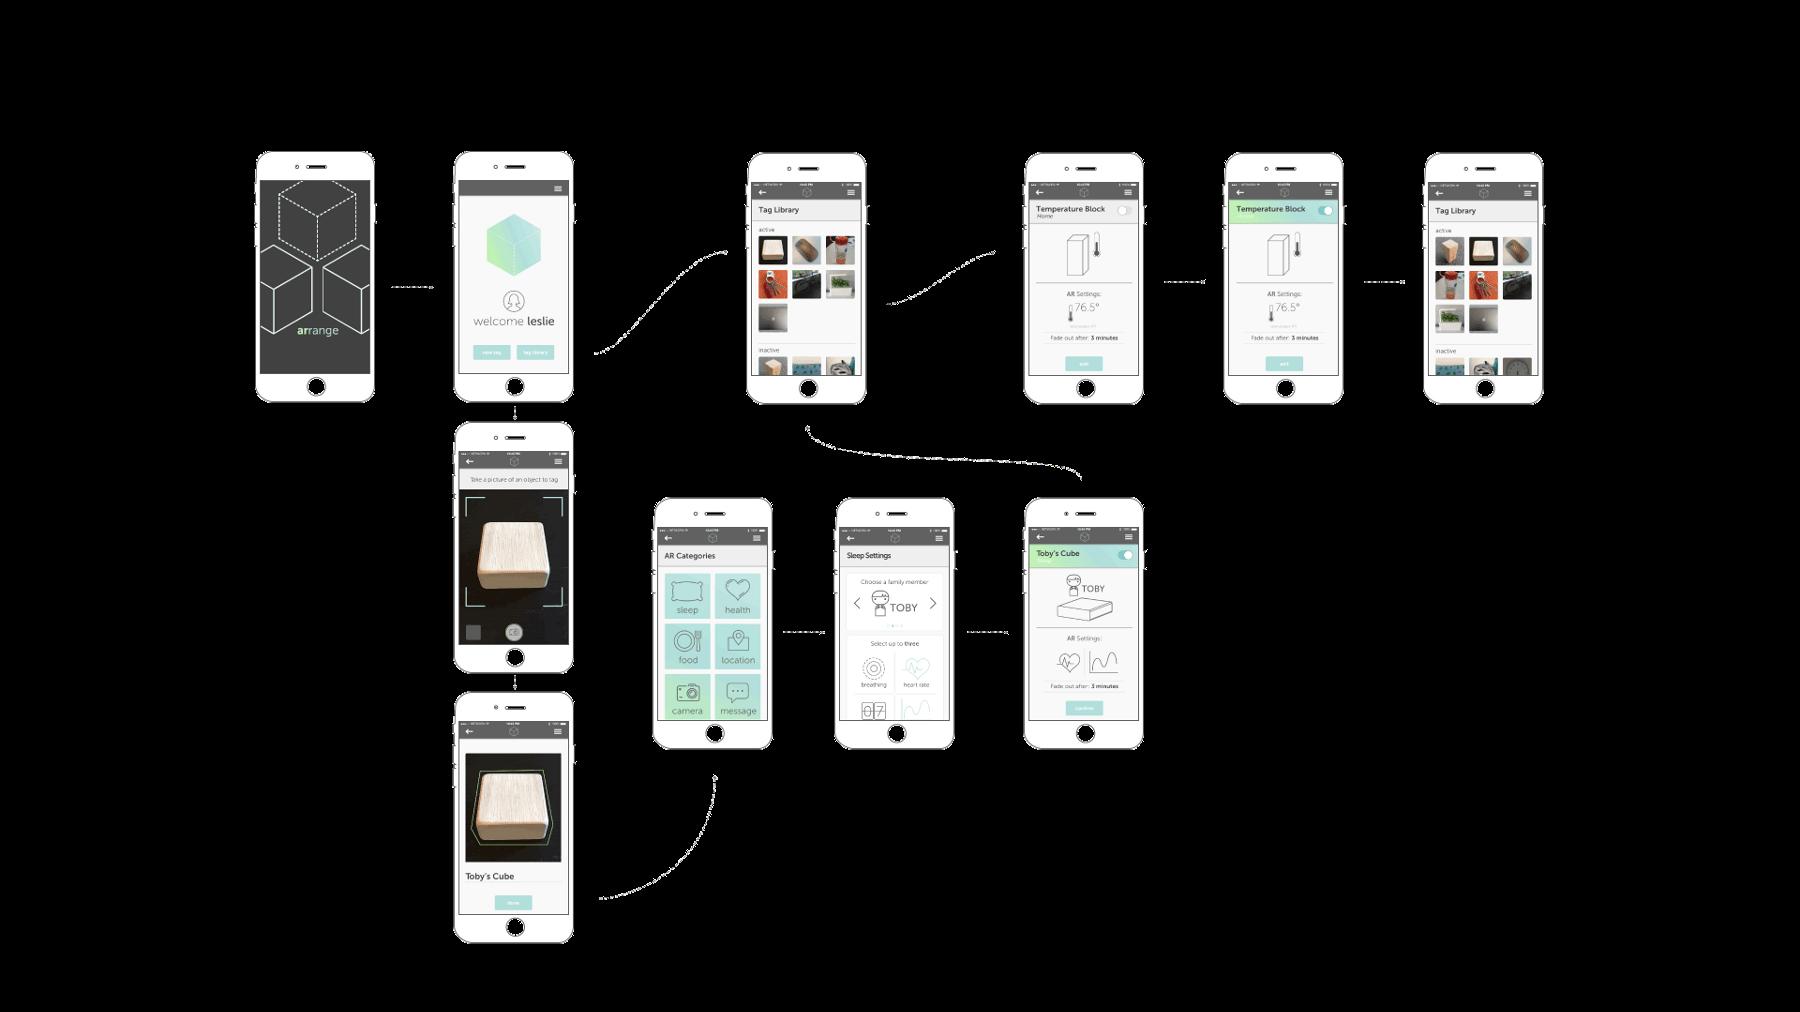 Final mobile app flow